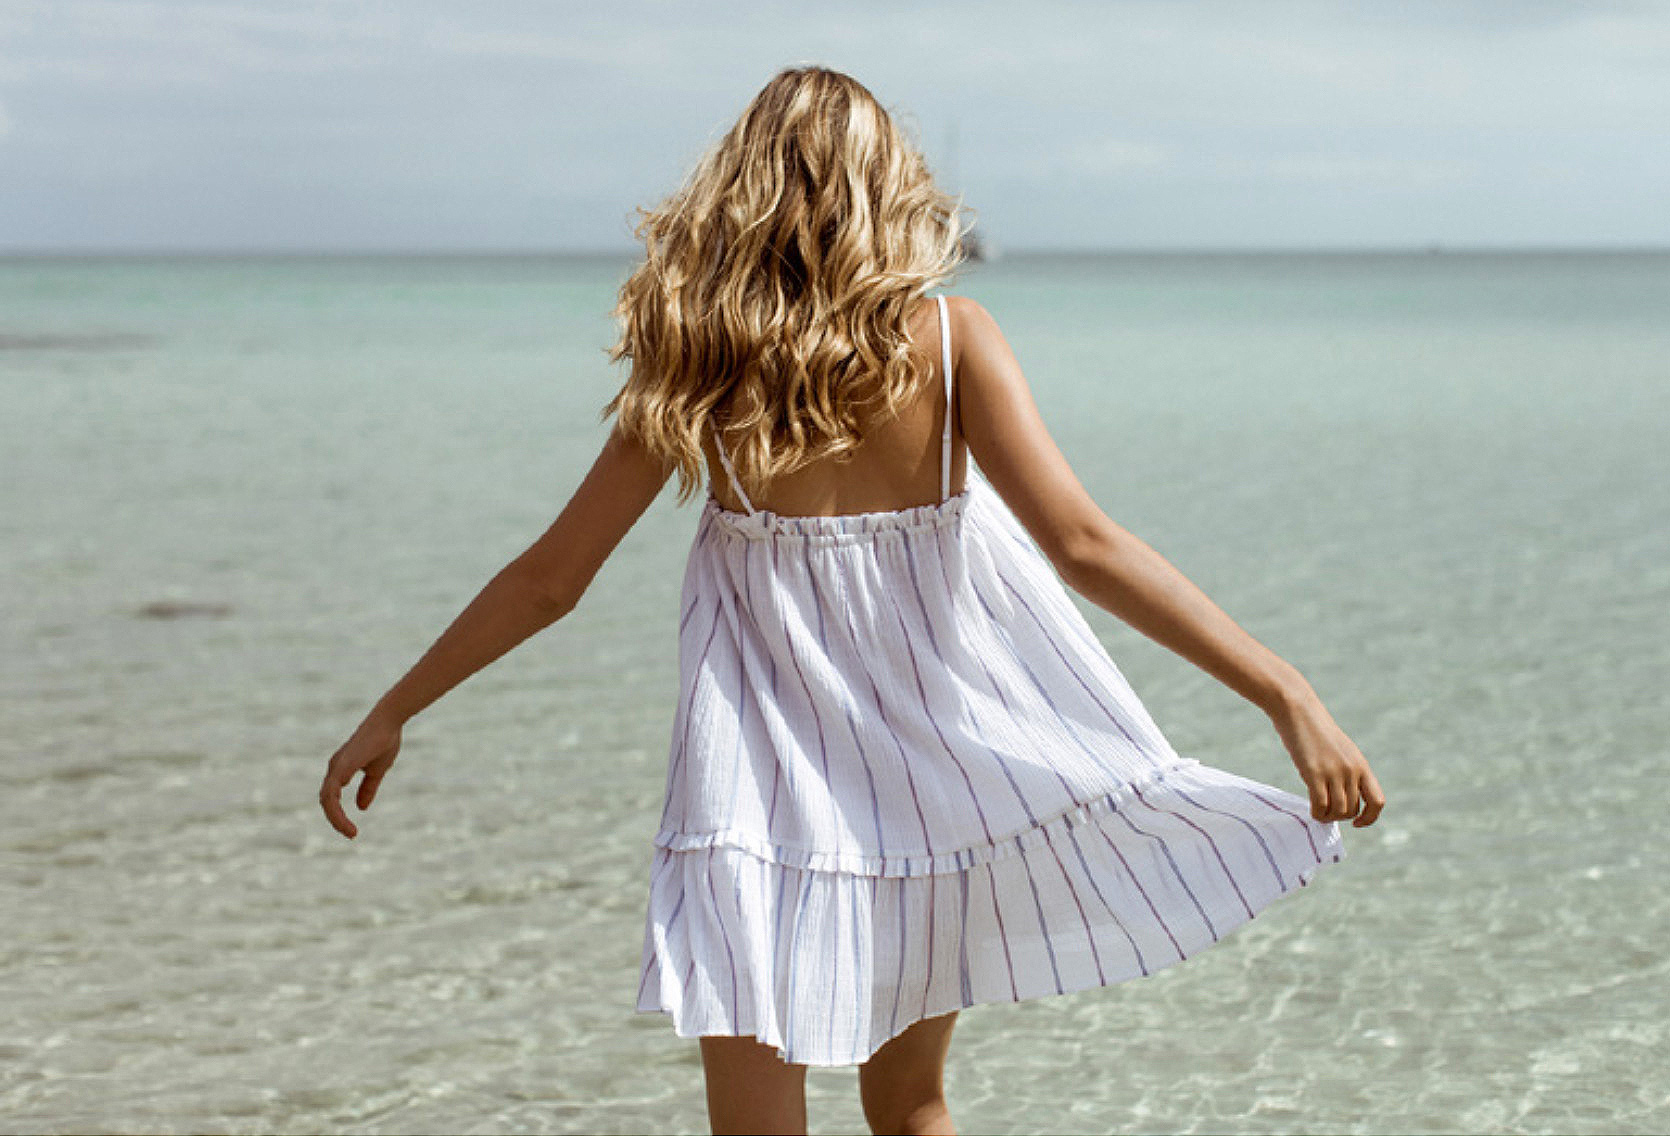 dress-from-behind.jpg